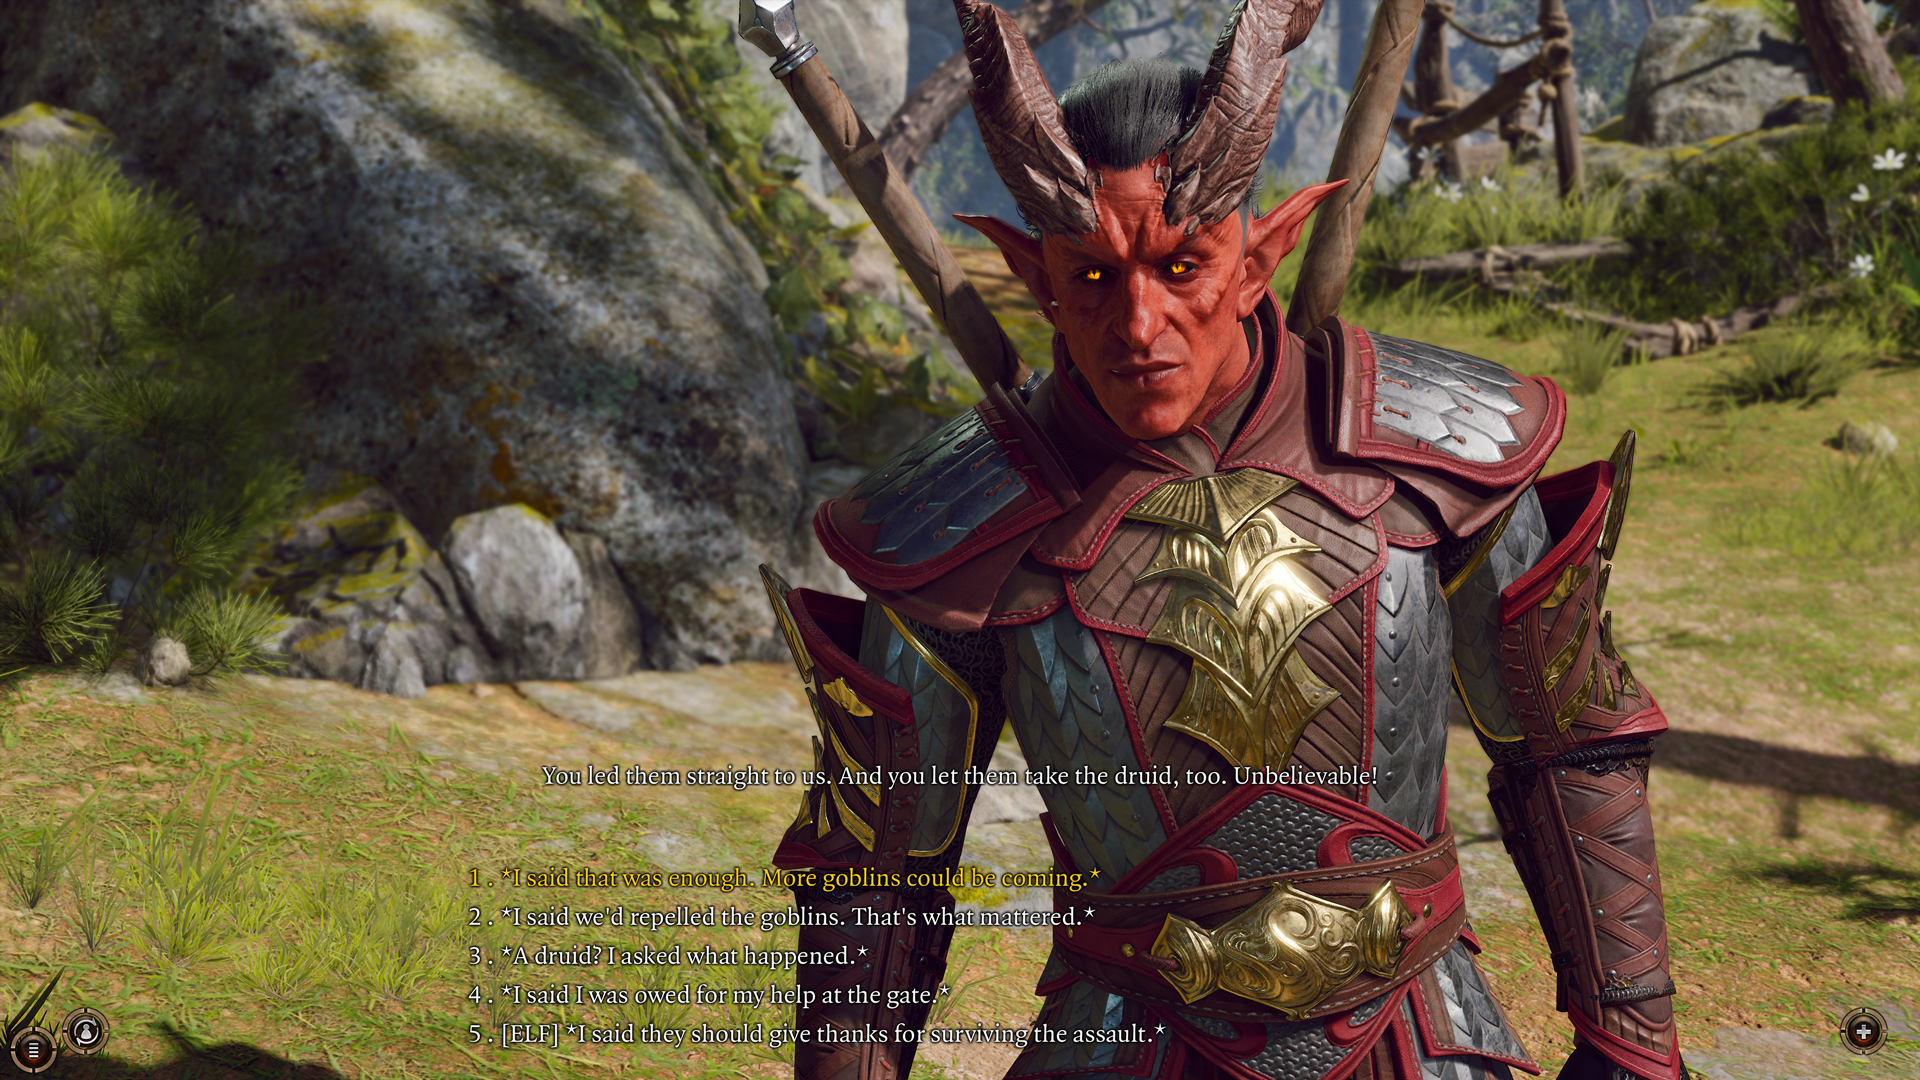 Baldur S Gate 3 Studio Teases More News In June Including Some For Divinity Gamesradar